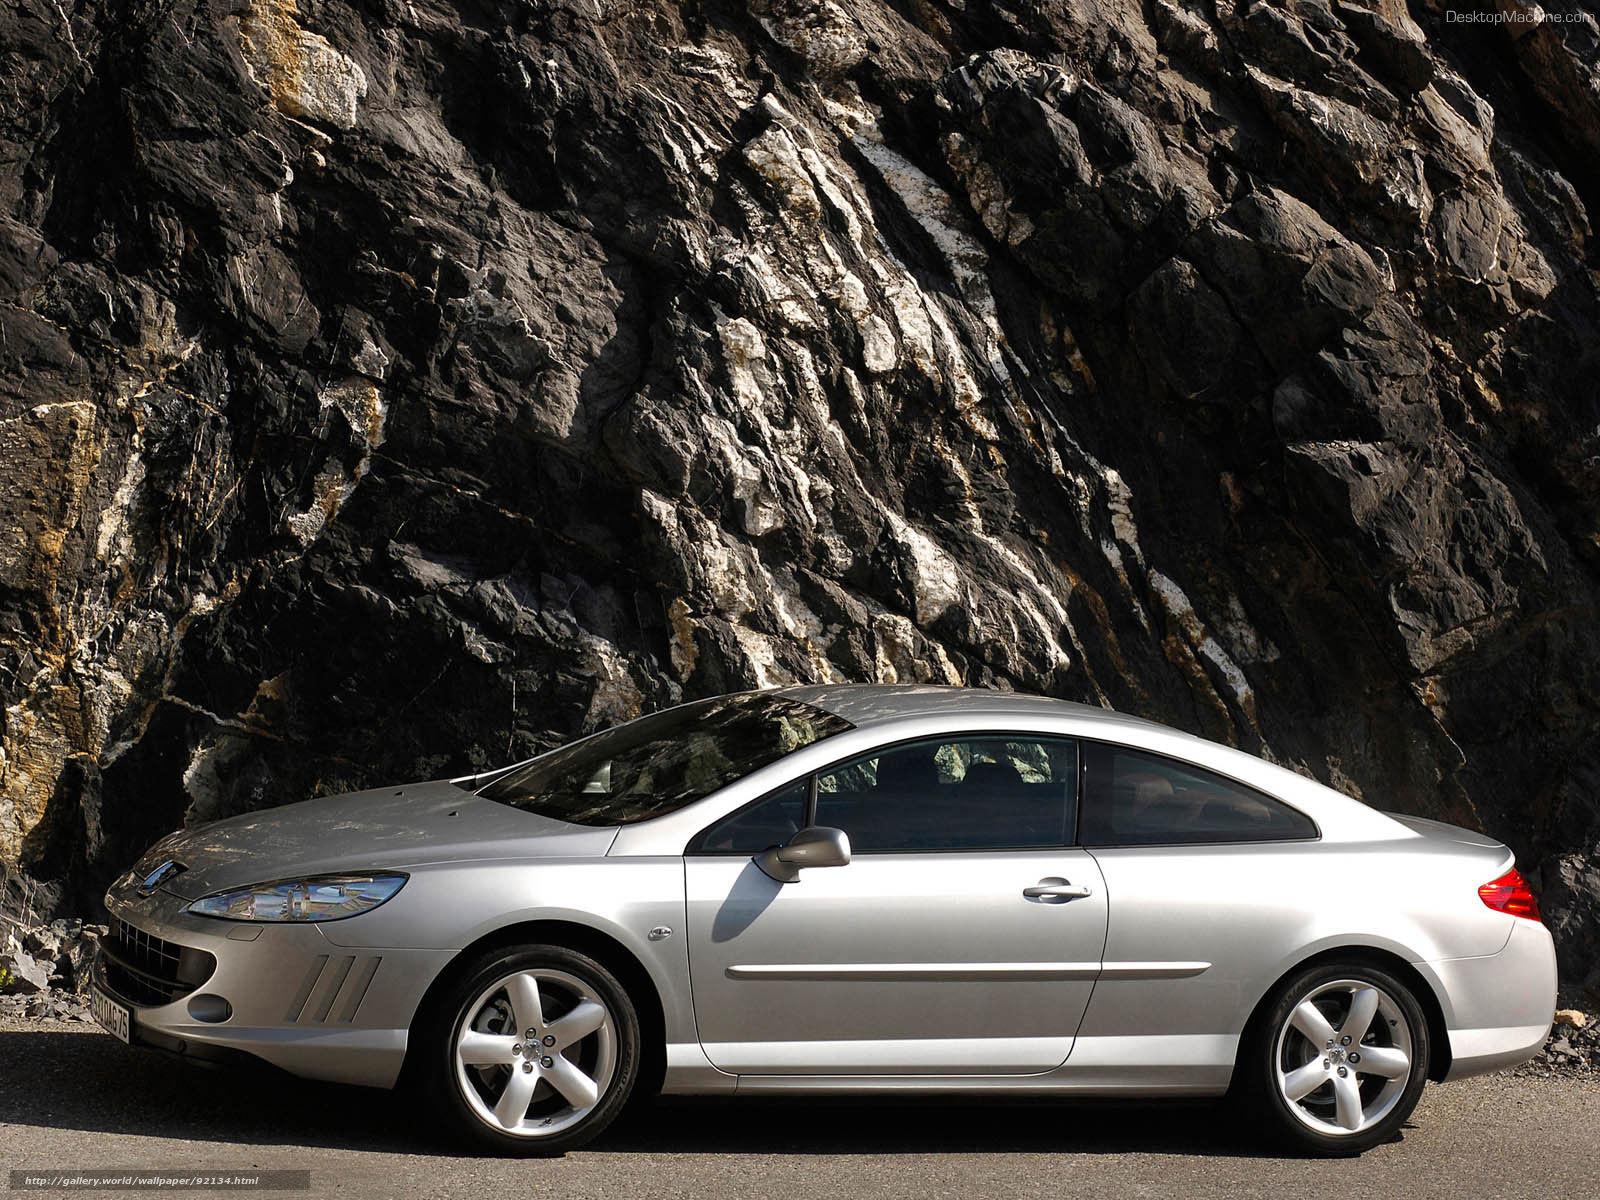 Peugeot, 407, авто, машины, автомобили, фото, обои, картинка ...